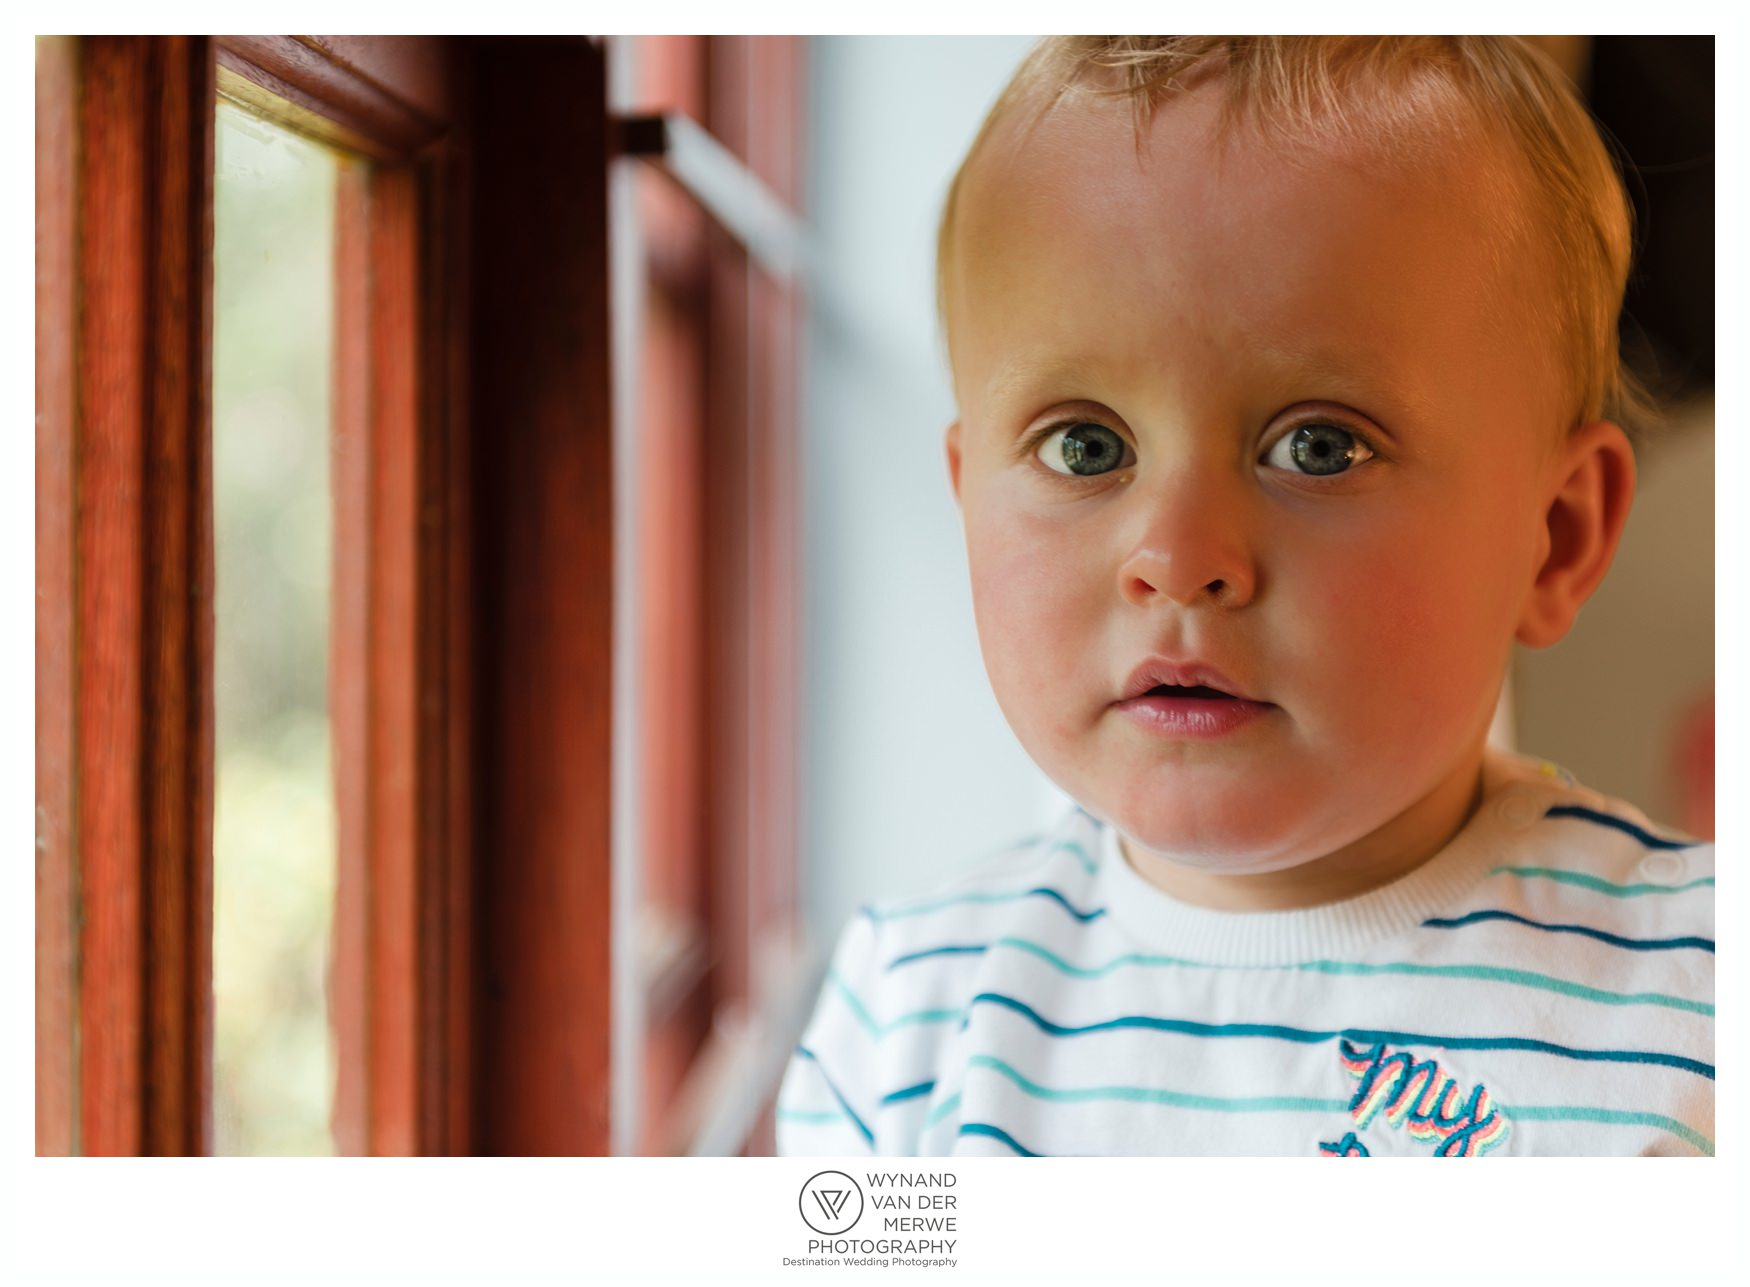 Wynandvandermerwe kirsten robert family lifestyle photography benoni location gauteng-105.jpg